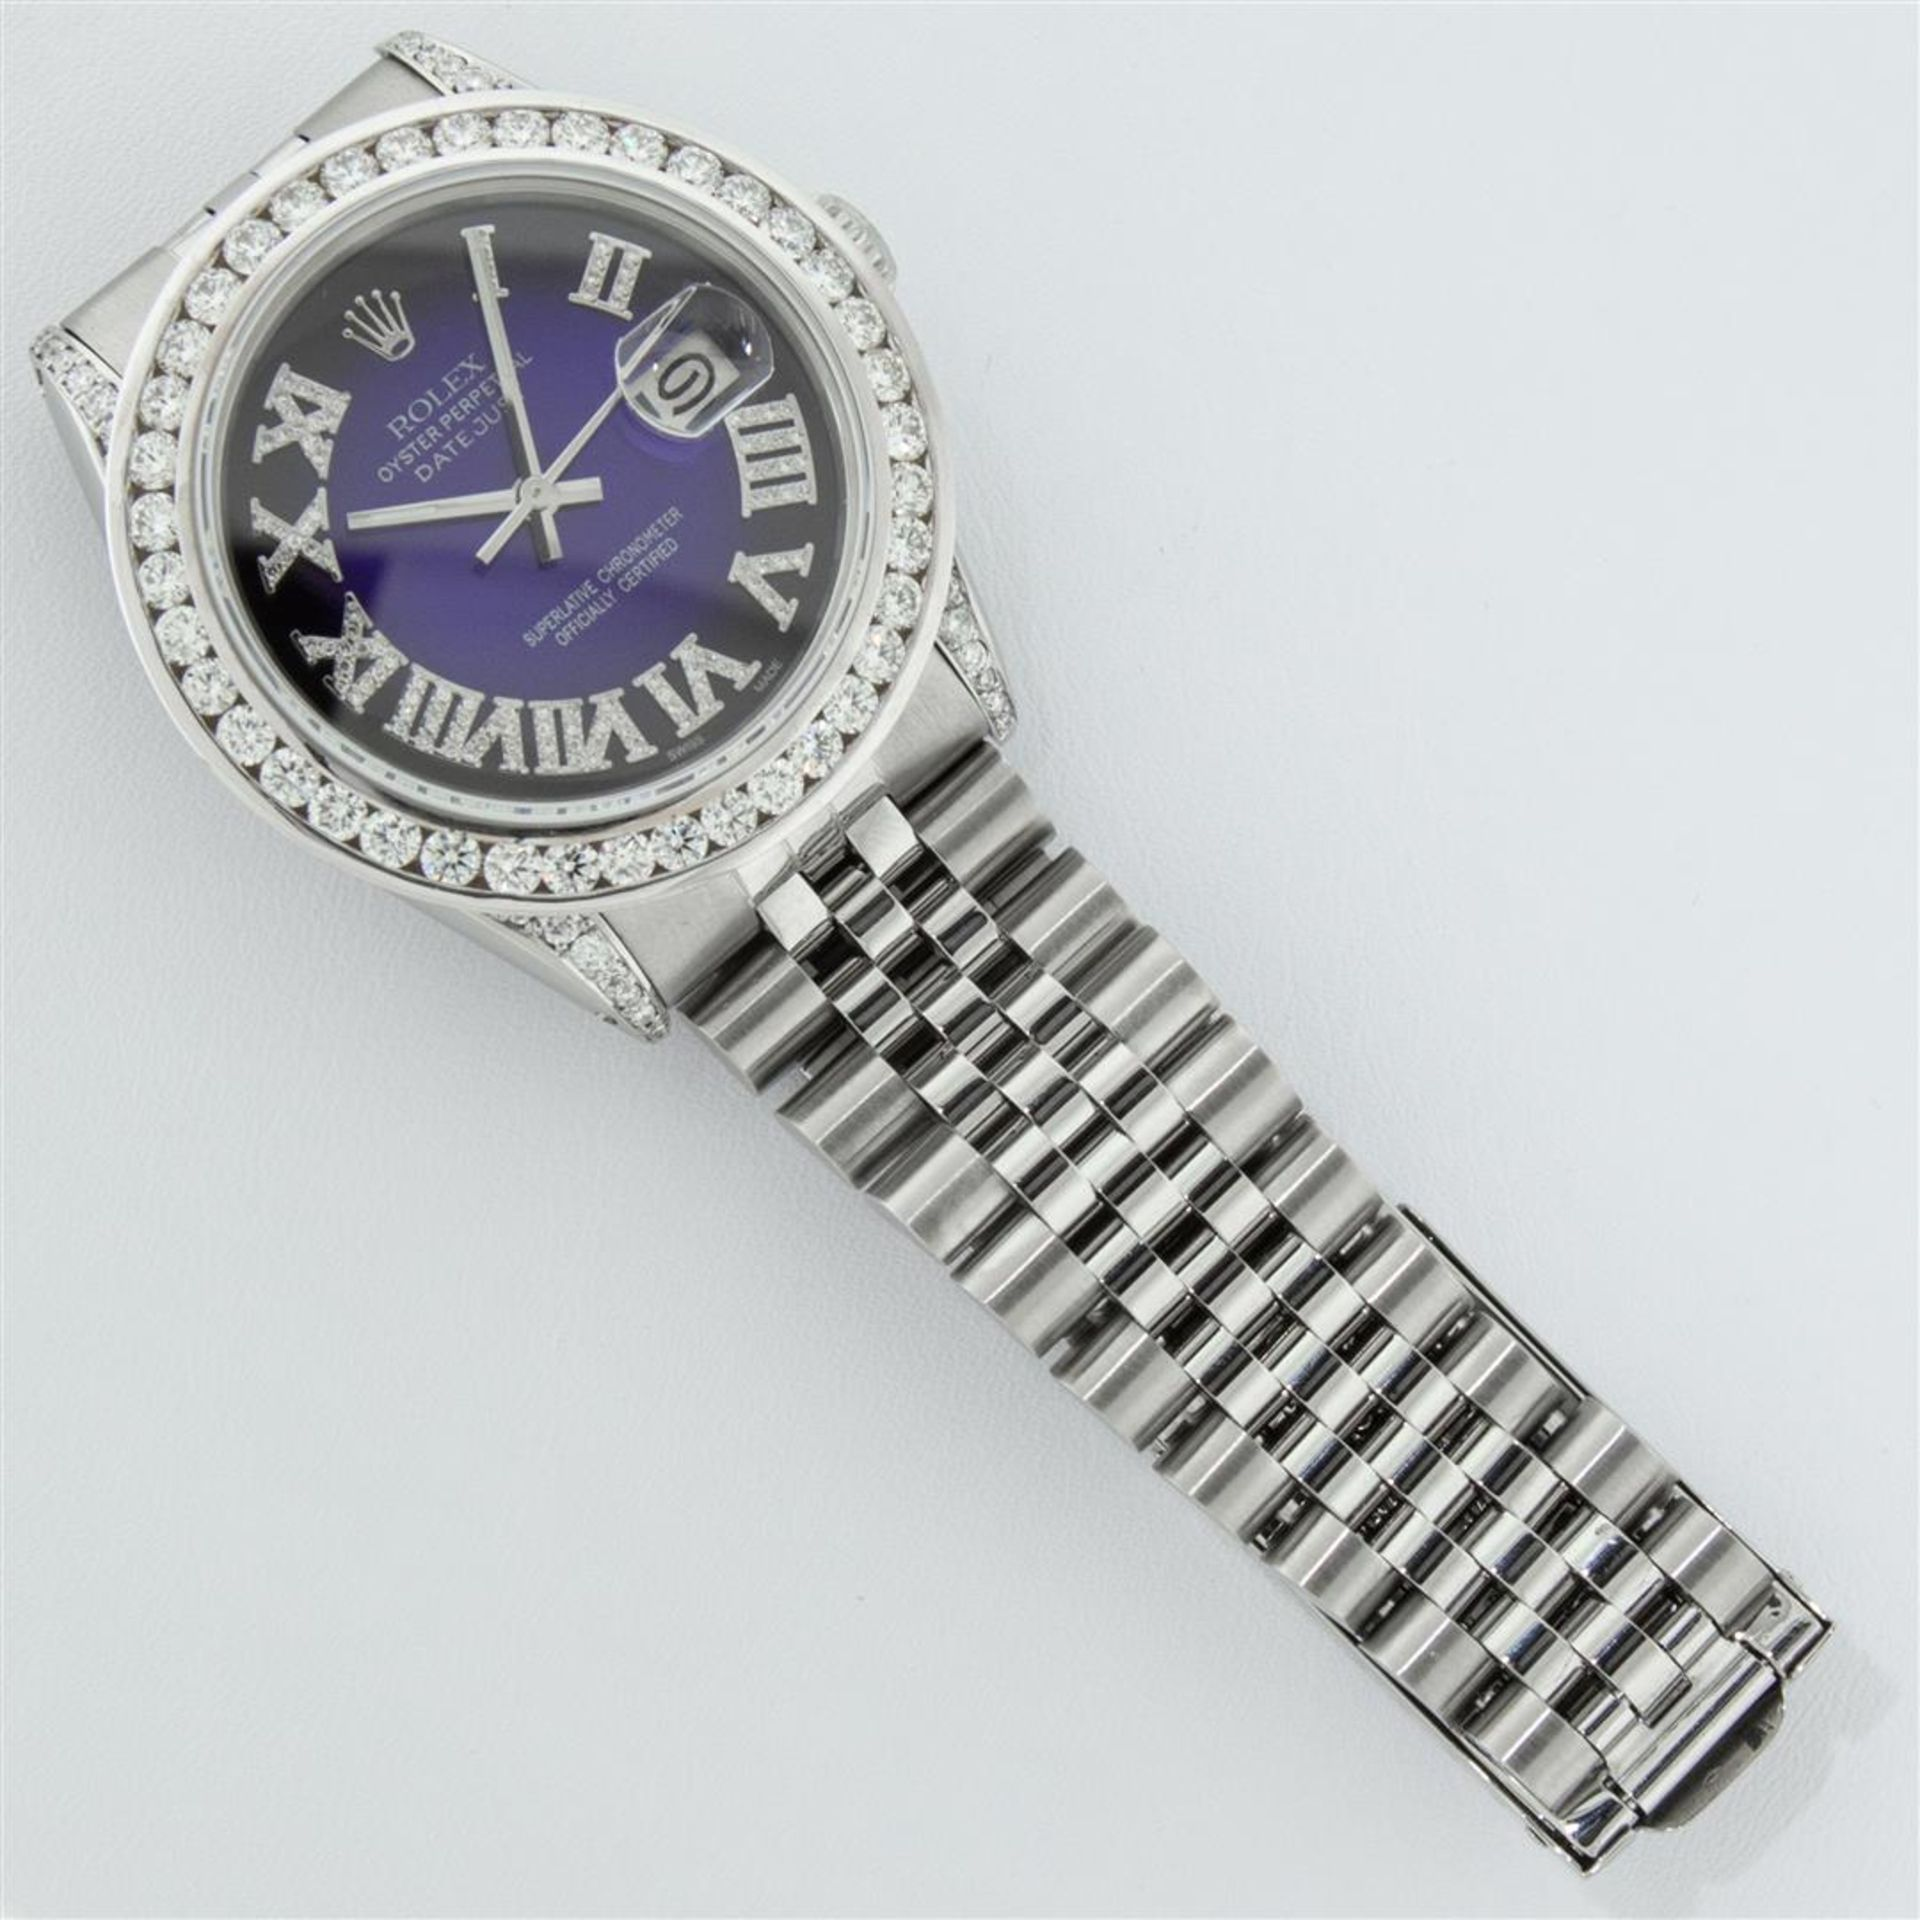 Rolex Mens Stainless Steel Blue Vignette Roman 3ctw Diamond Datejust Wristwatch - Image 8 of 9